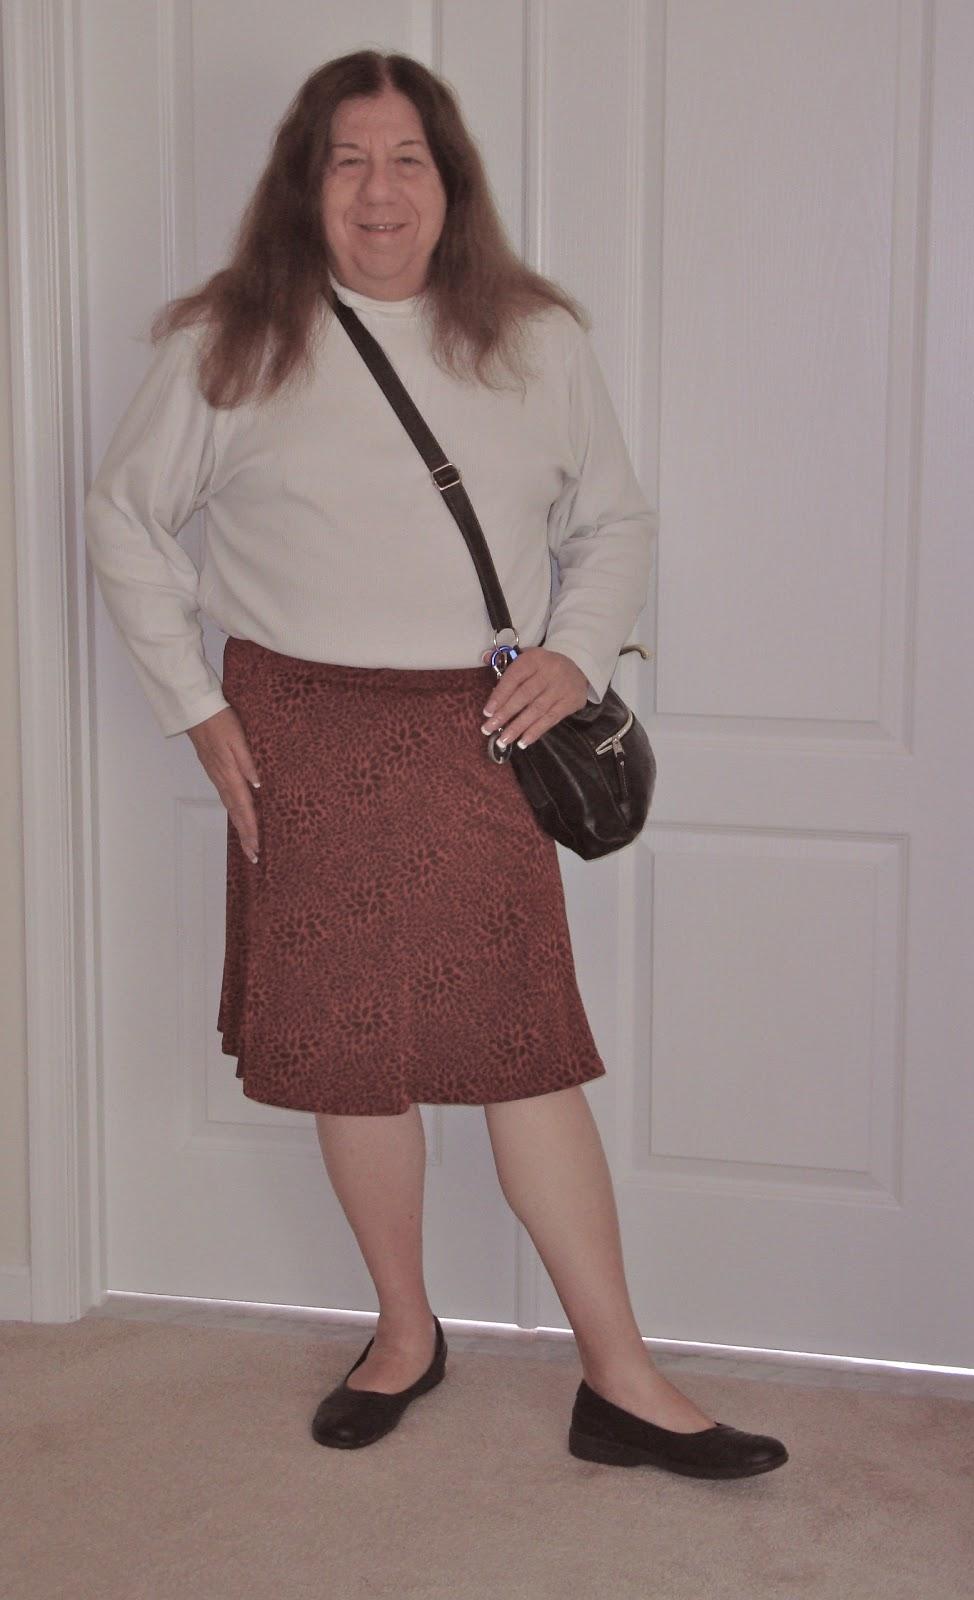 Skirt Pantyhose 59